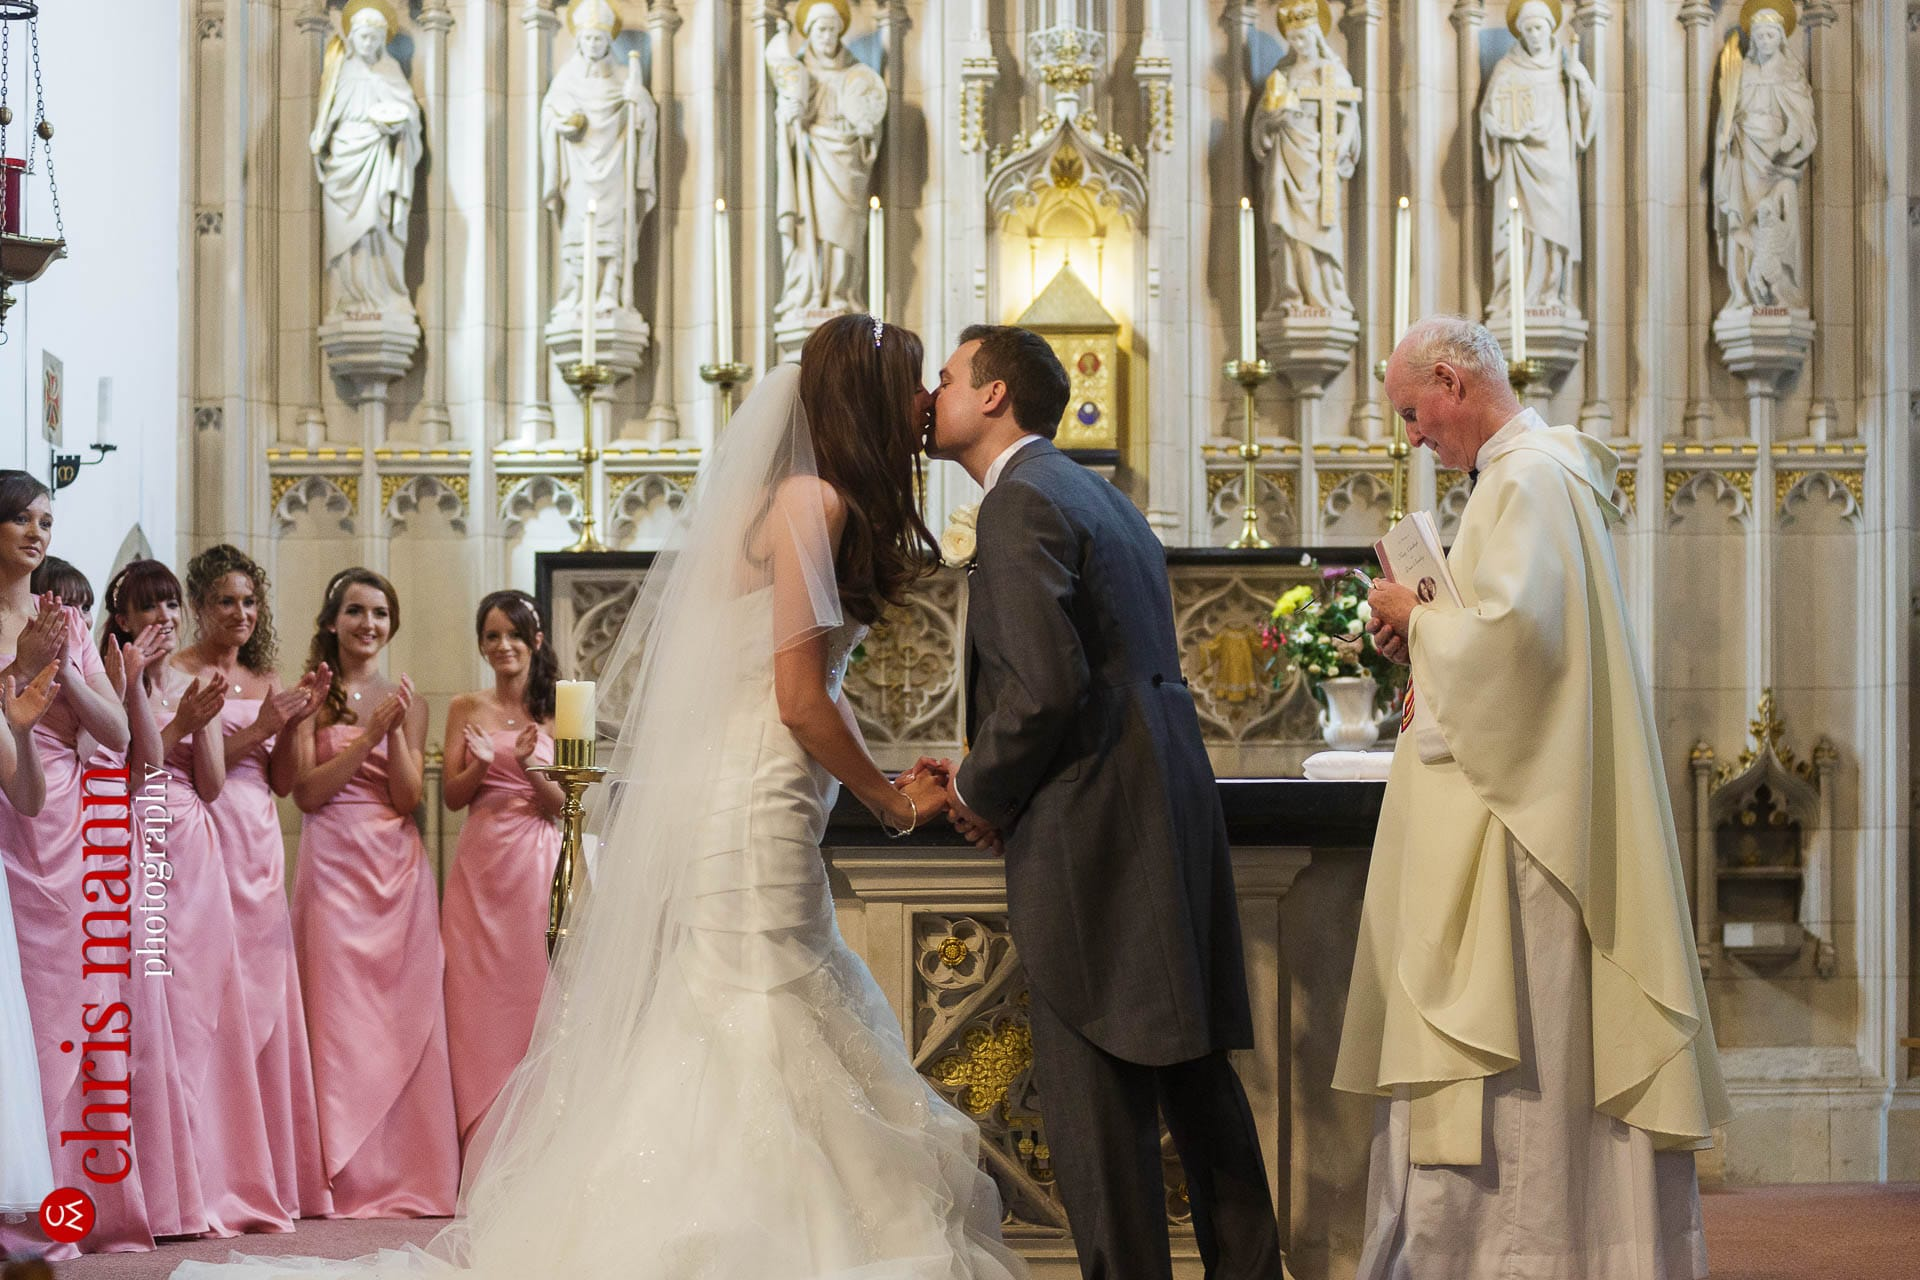 Brocket-Hall-wedding-photography-018